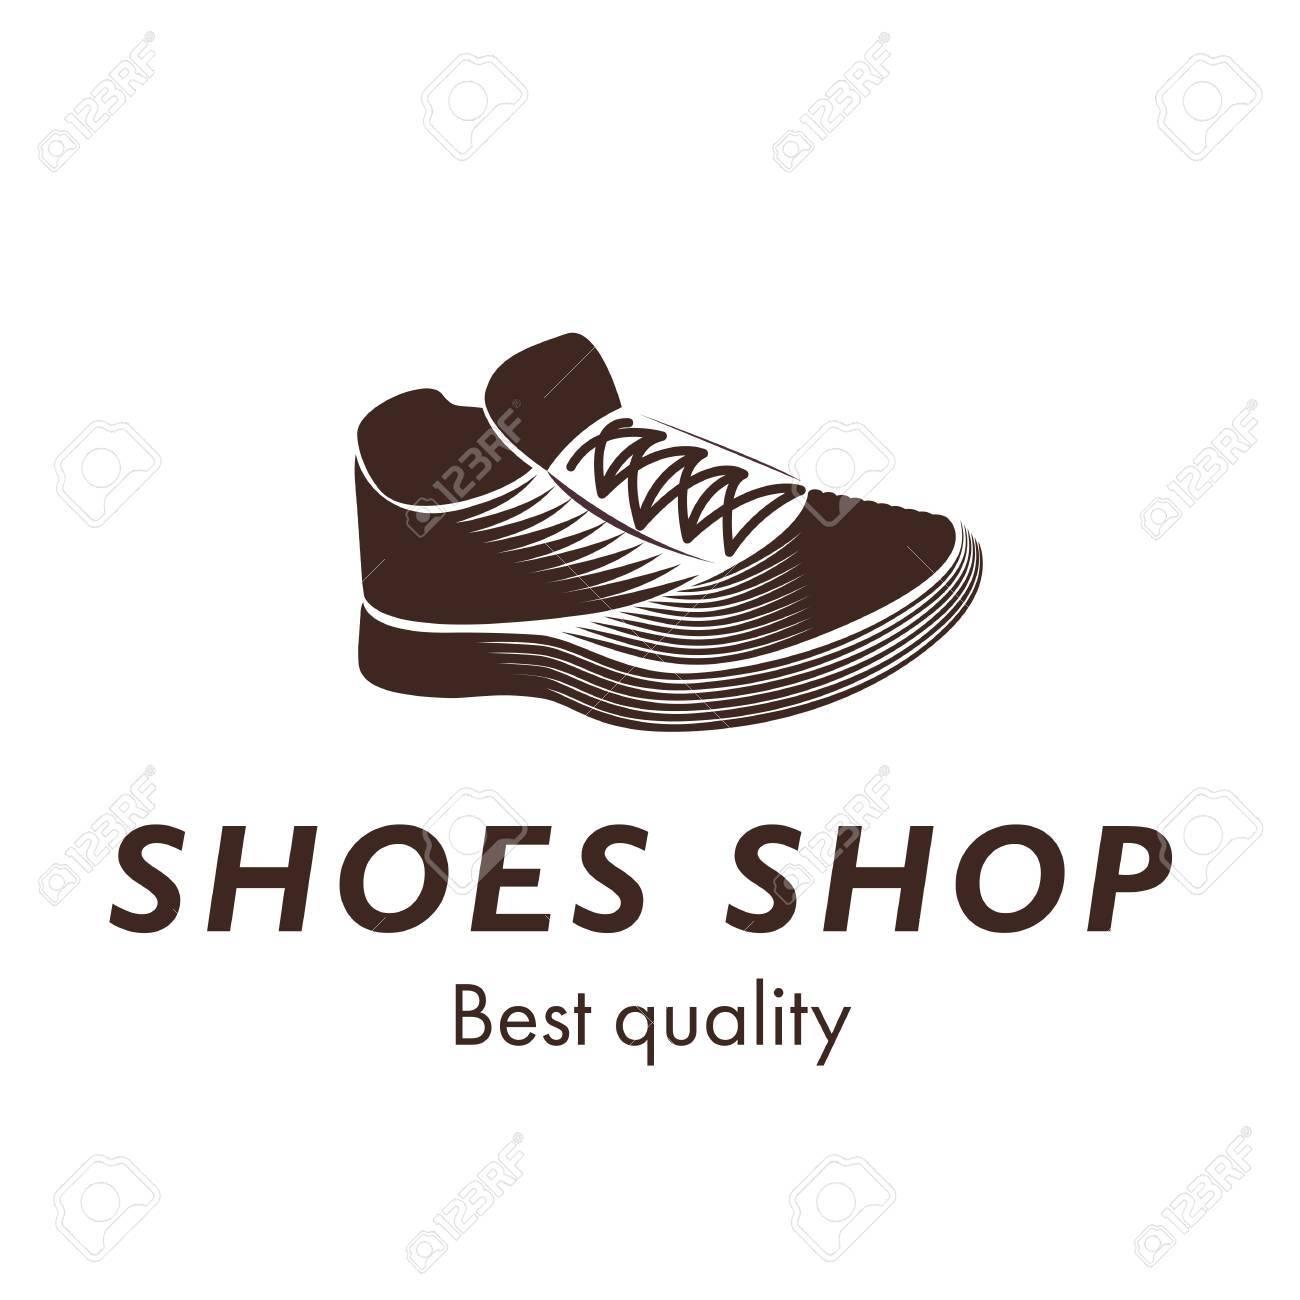 Sports Shoes Shop Best Quality Vector